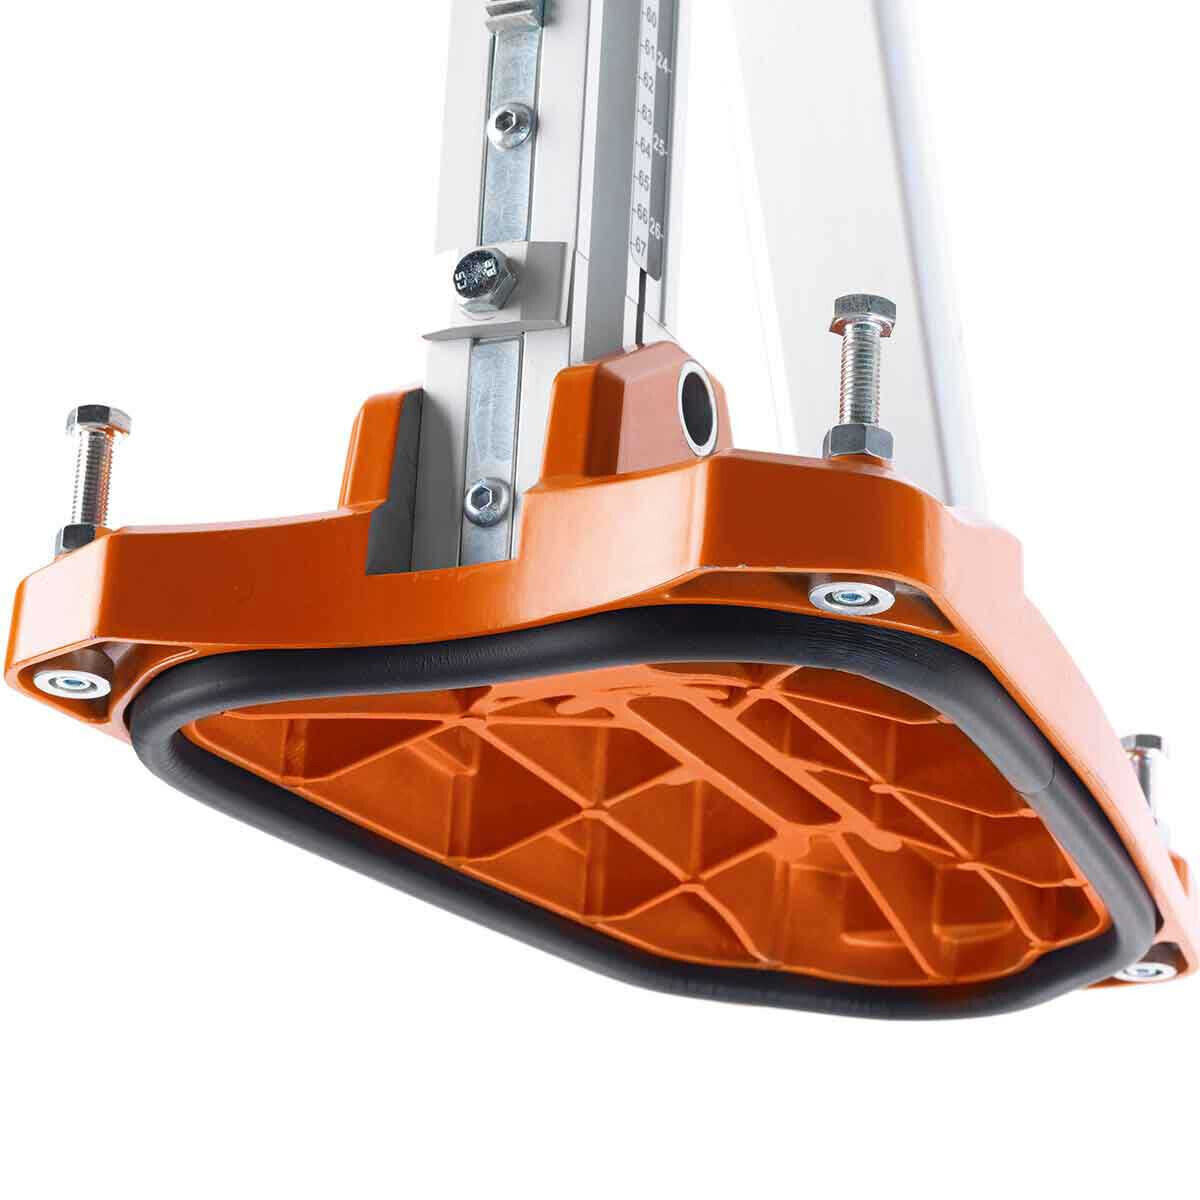 Husqvarna DS150 Core Drill Stand Vacuum Base